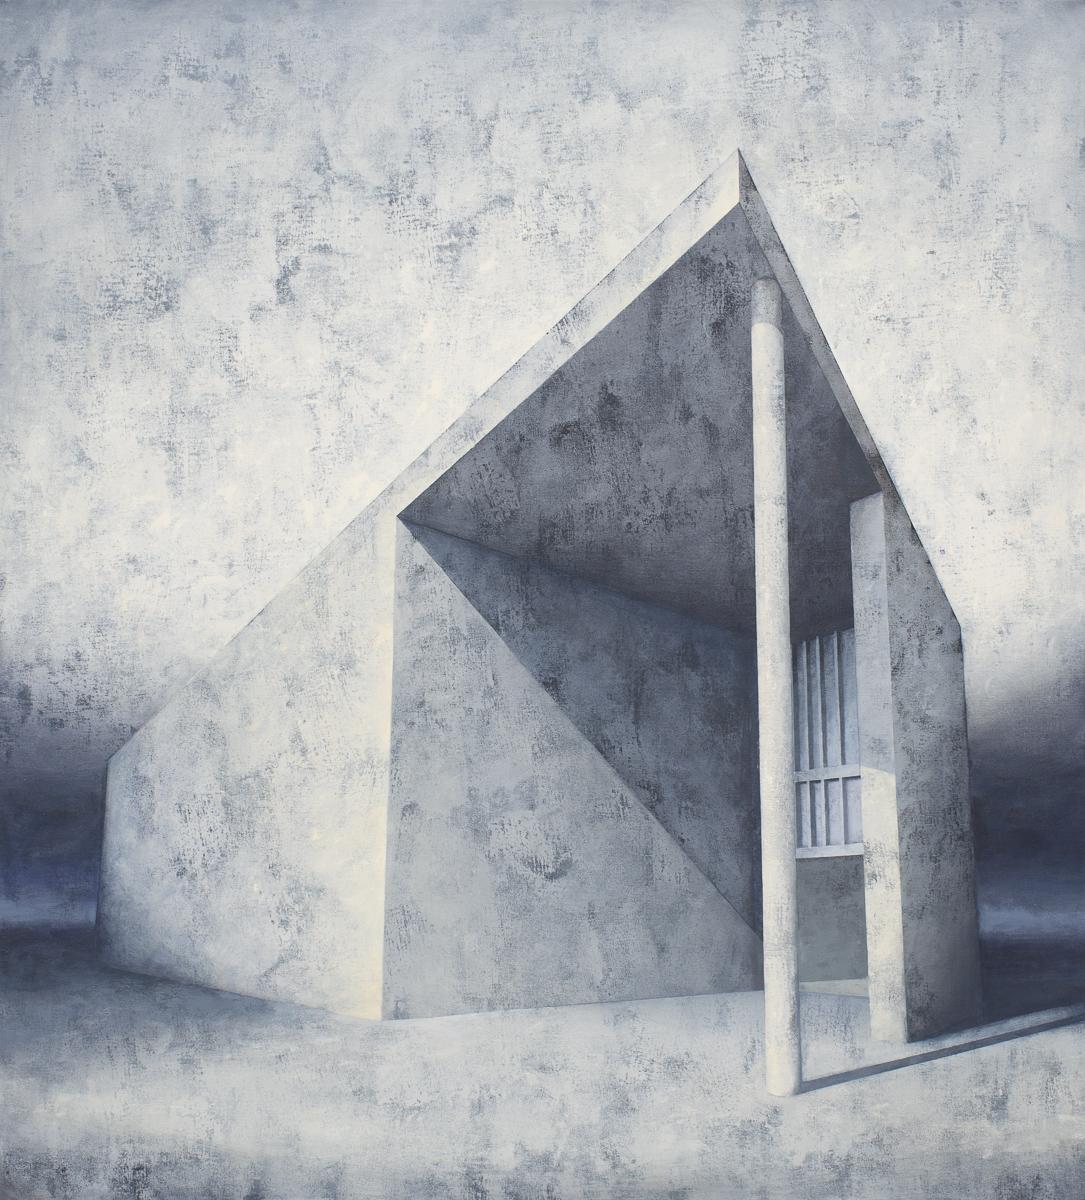 Element modernistyczny - kadr 21, 2016